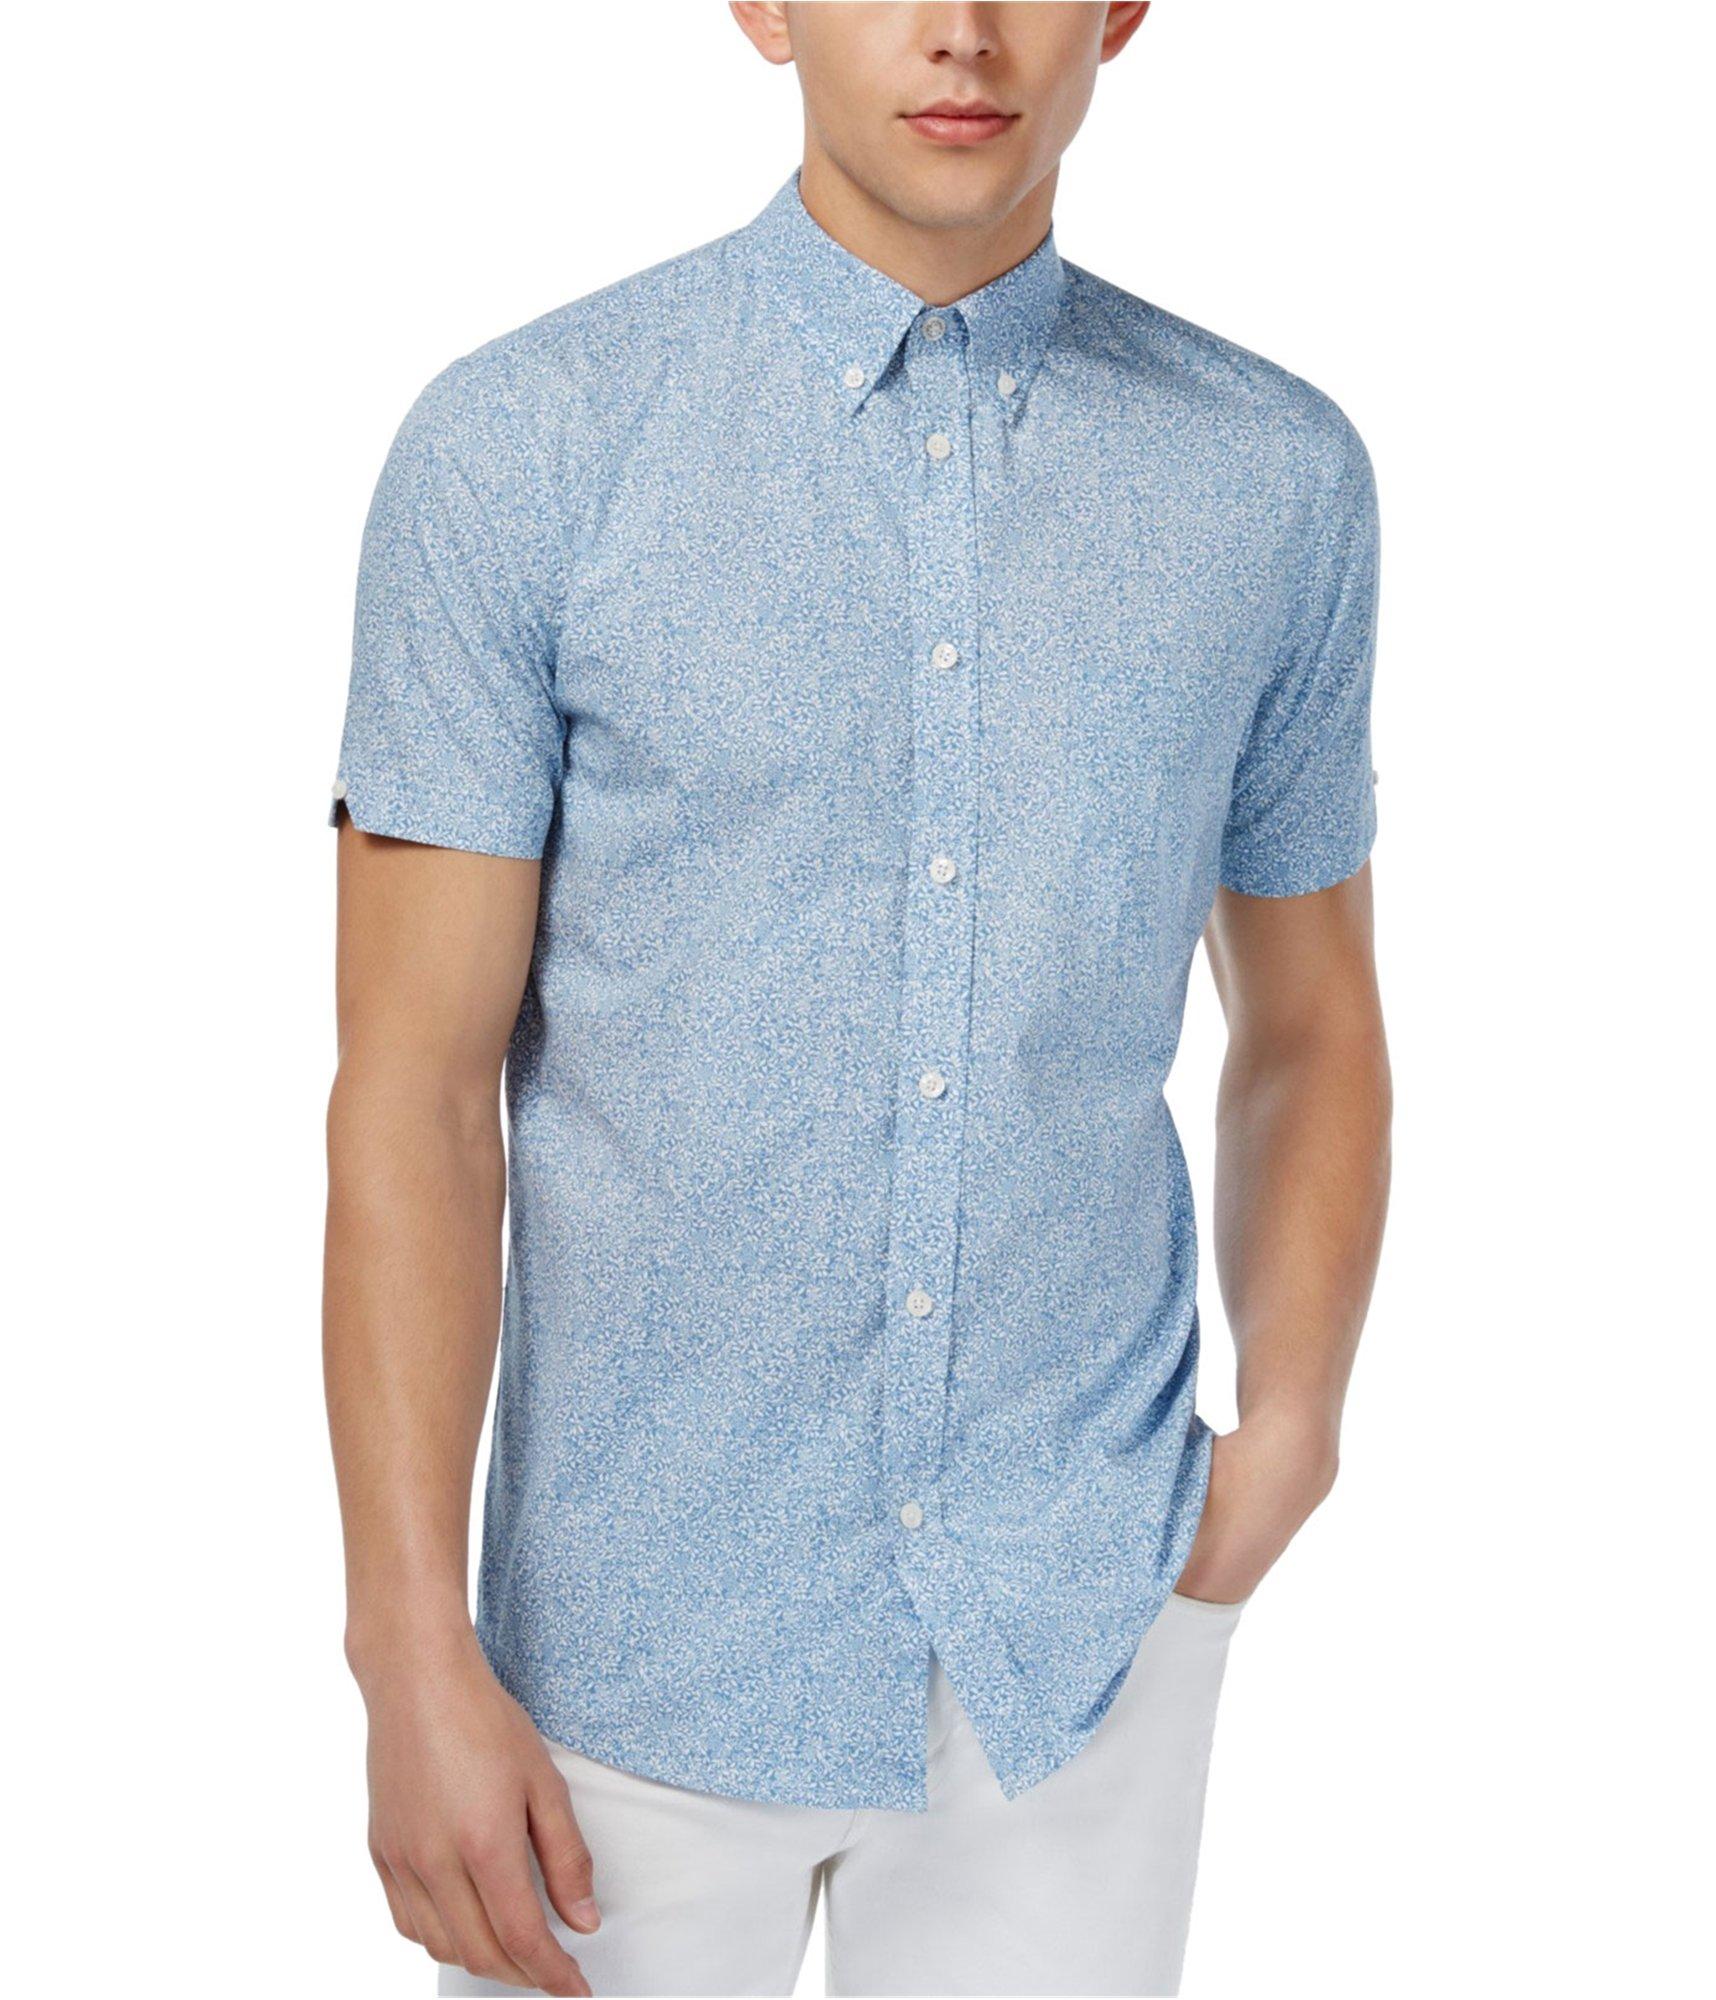 Ben Sherman Slim-Fit Floral Print Short Sleeve Button Down Shirt (Summer Sky, Medium)